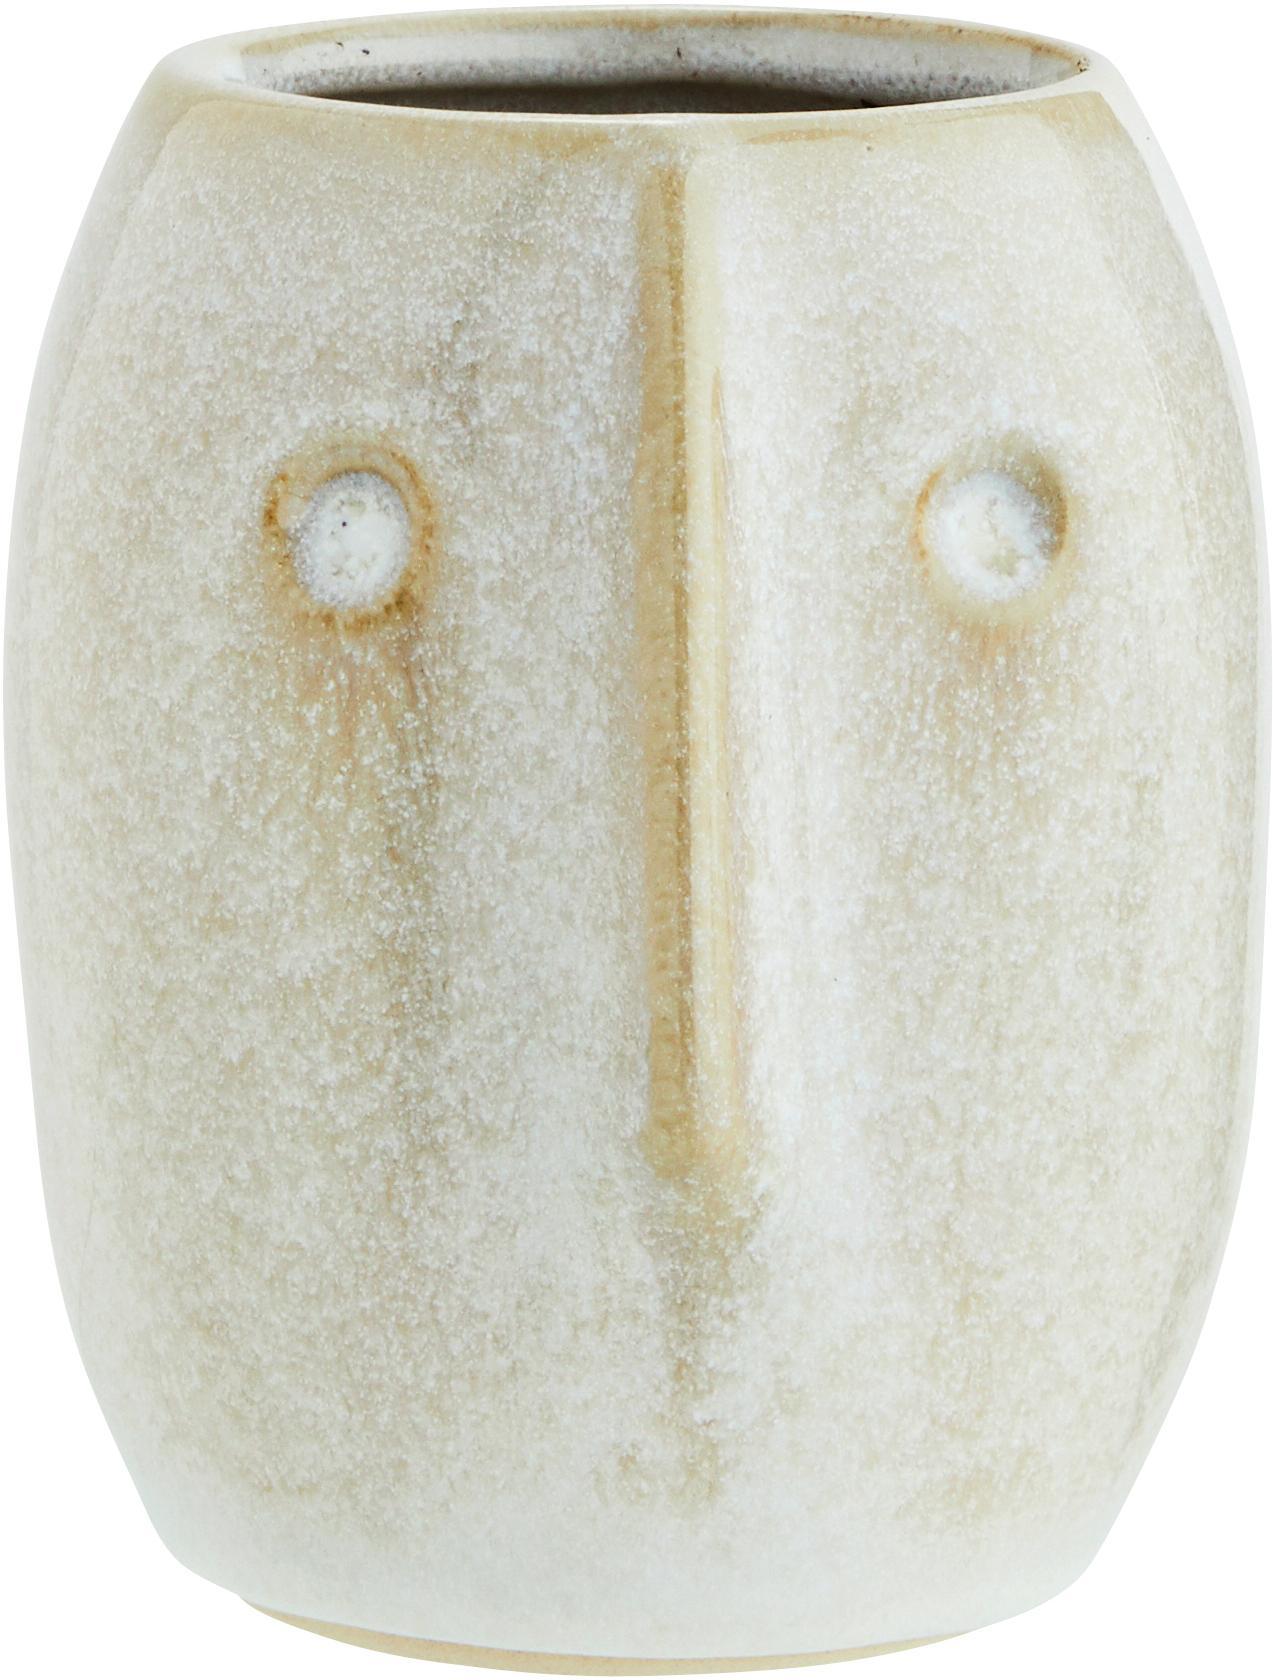 Portavaso in terracotta Face, Terracotta, Bianco, beige, Ø 8 x Alt. 10 cm